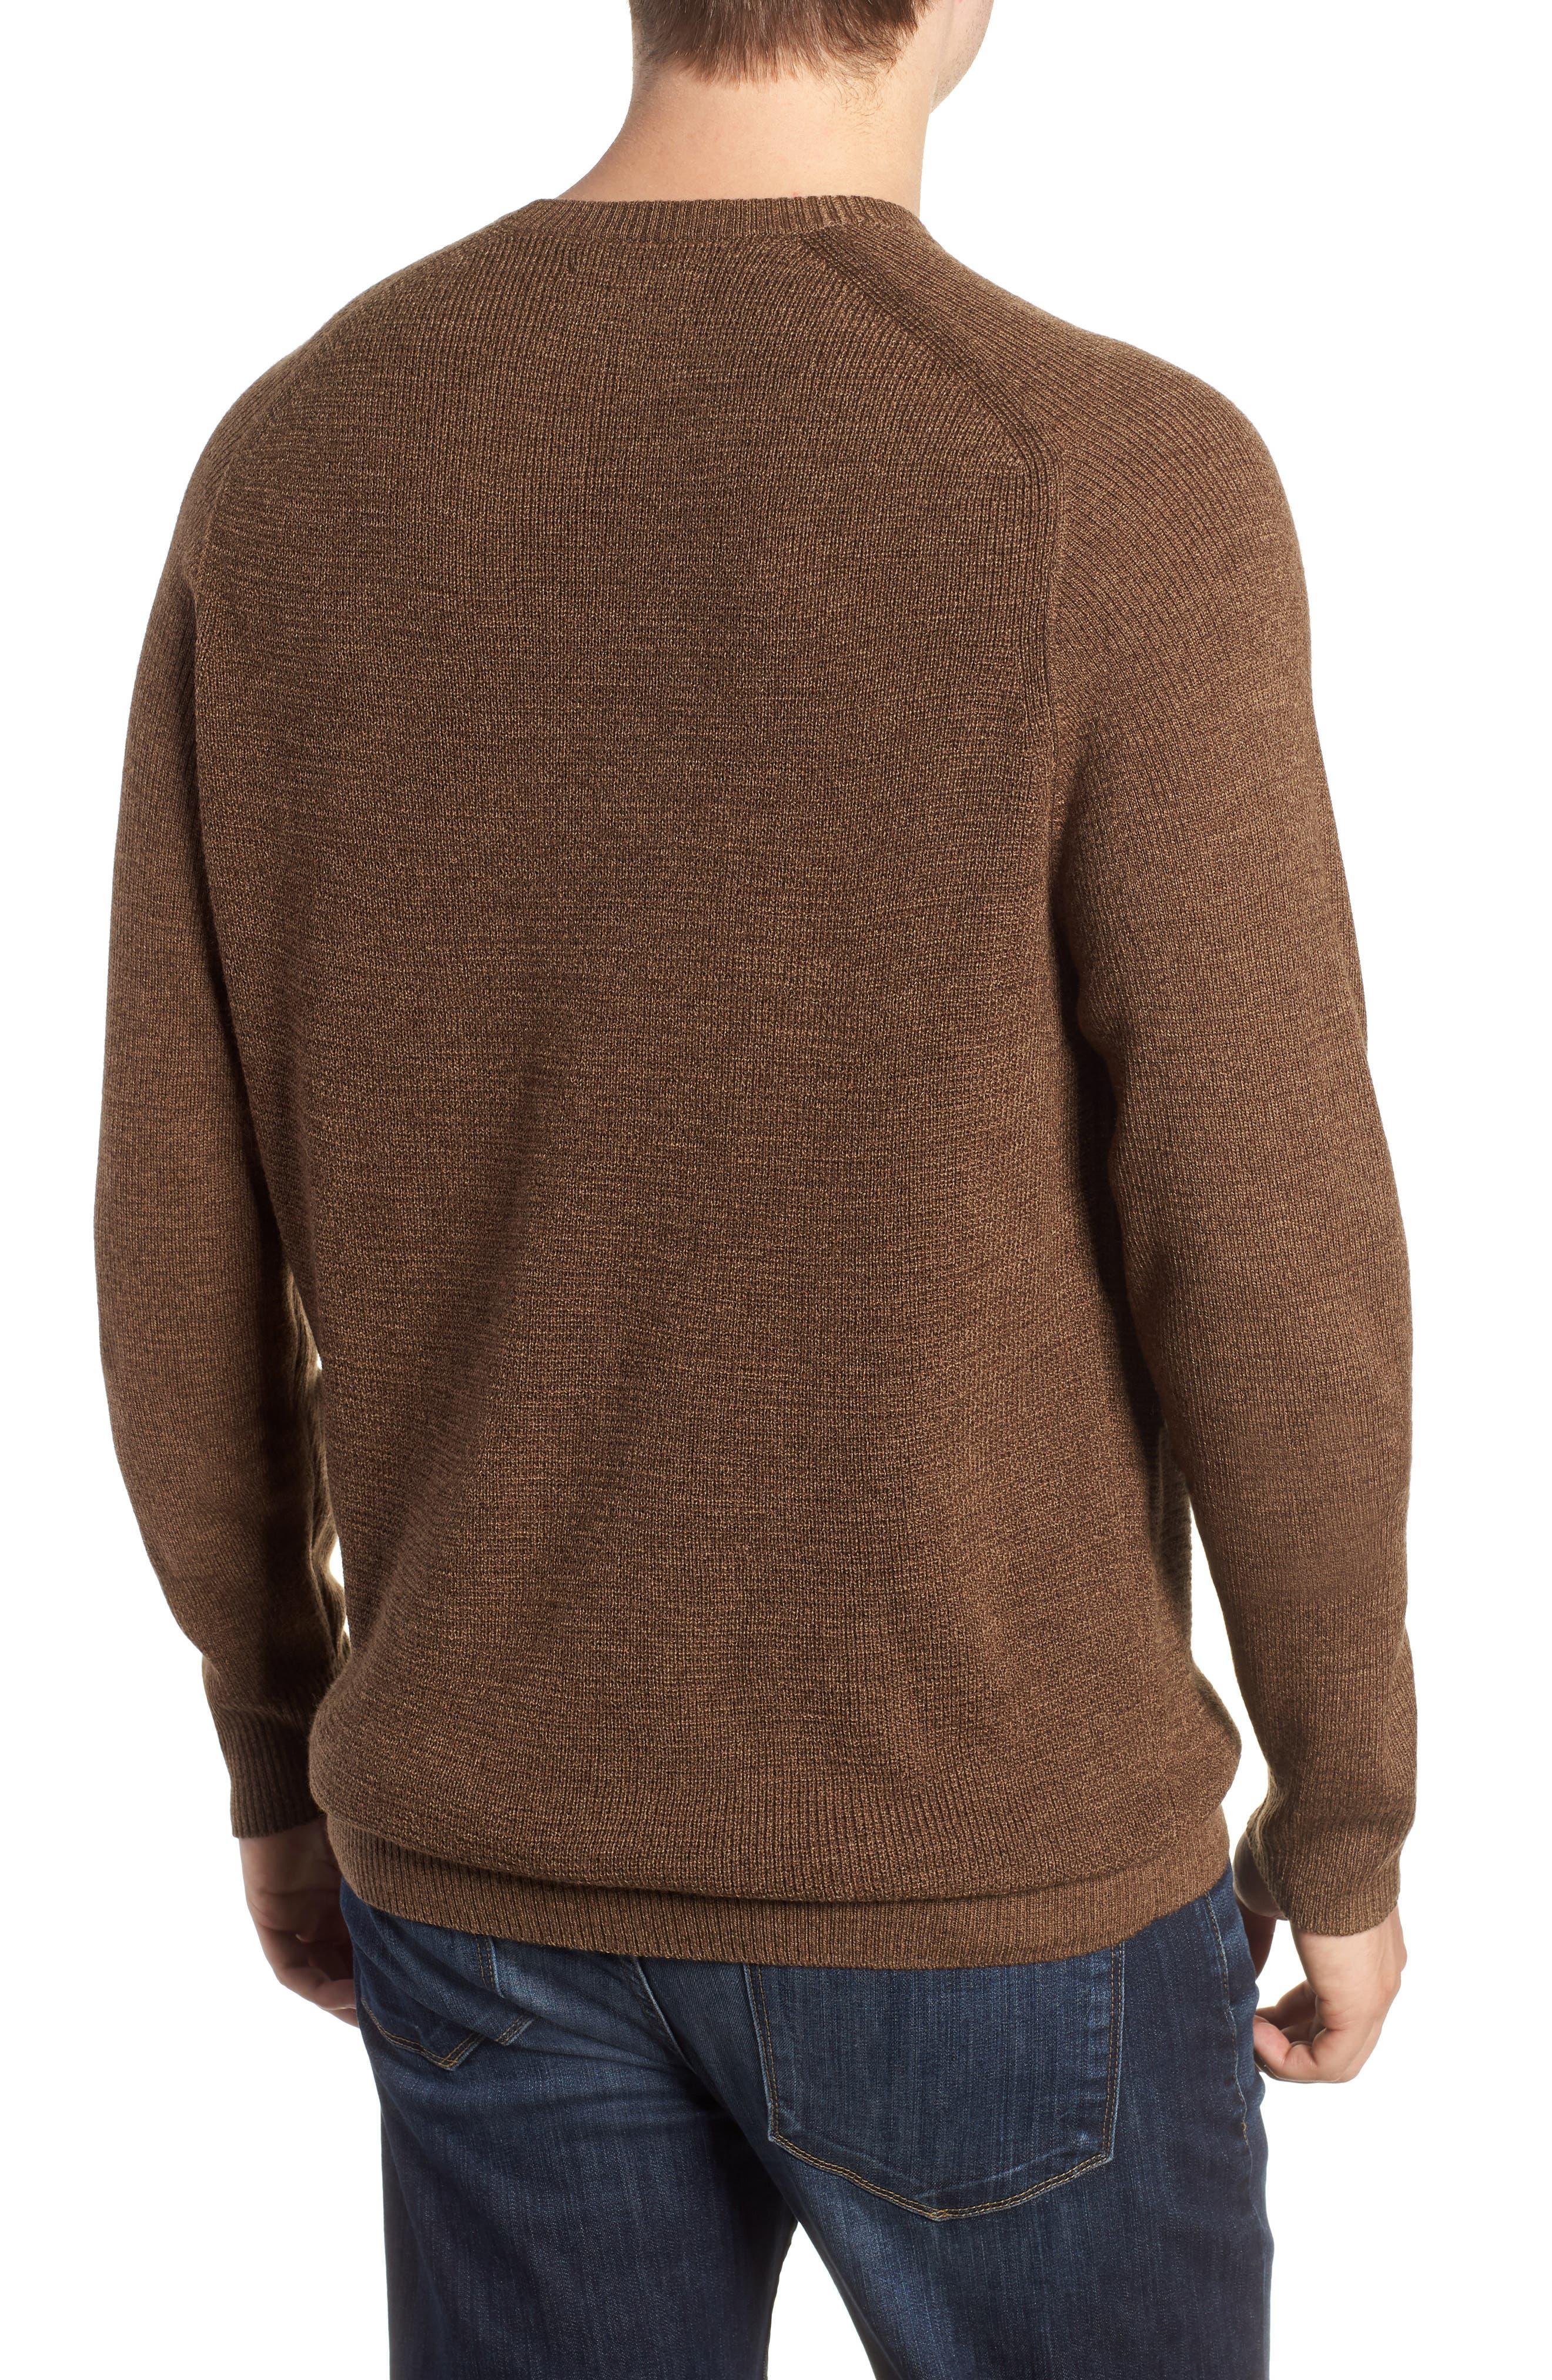 Crewneck Wool Blend Sweater,                             Alternate thumbnail 2, color,                             BROWN MAJOR